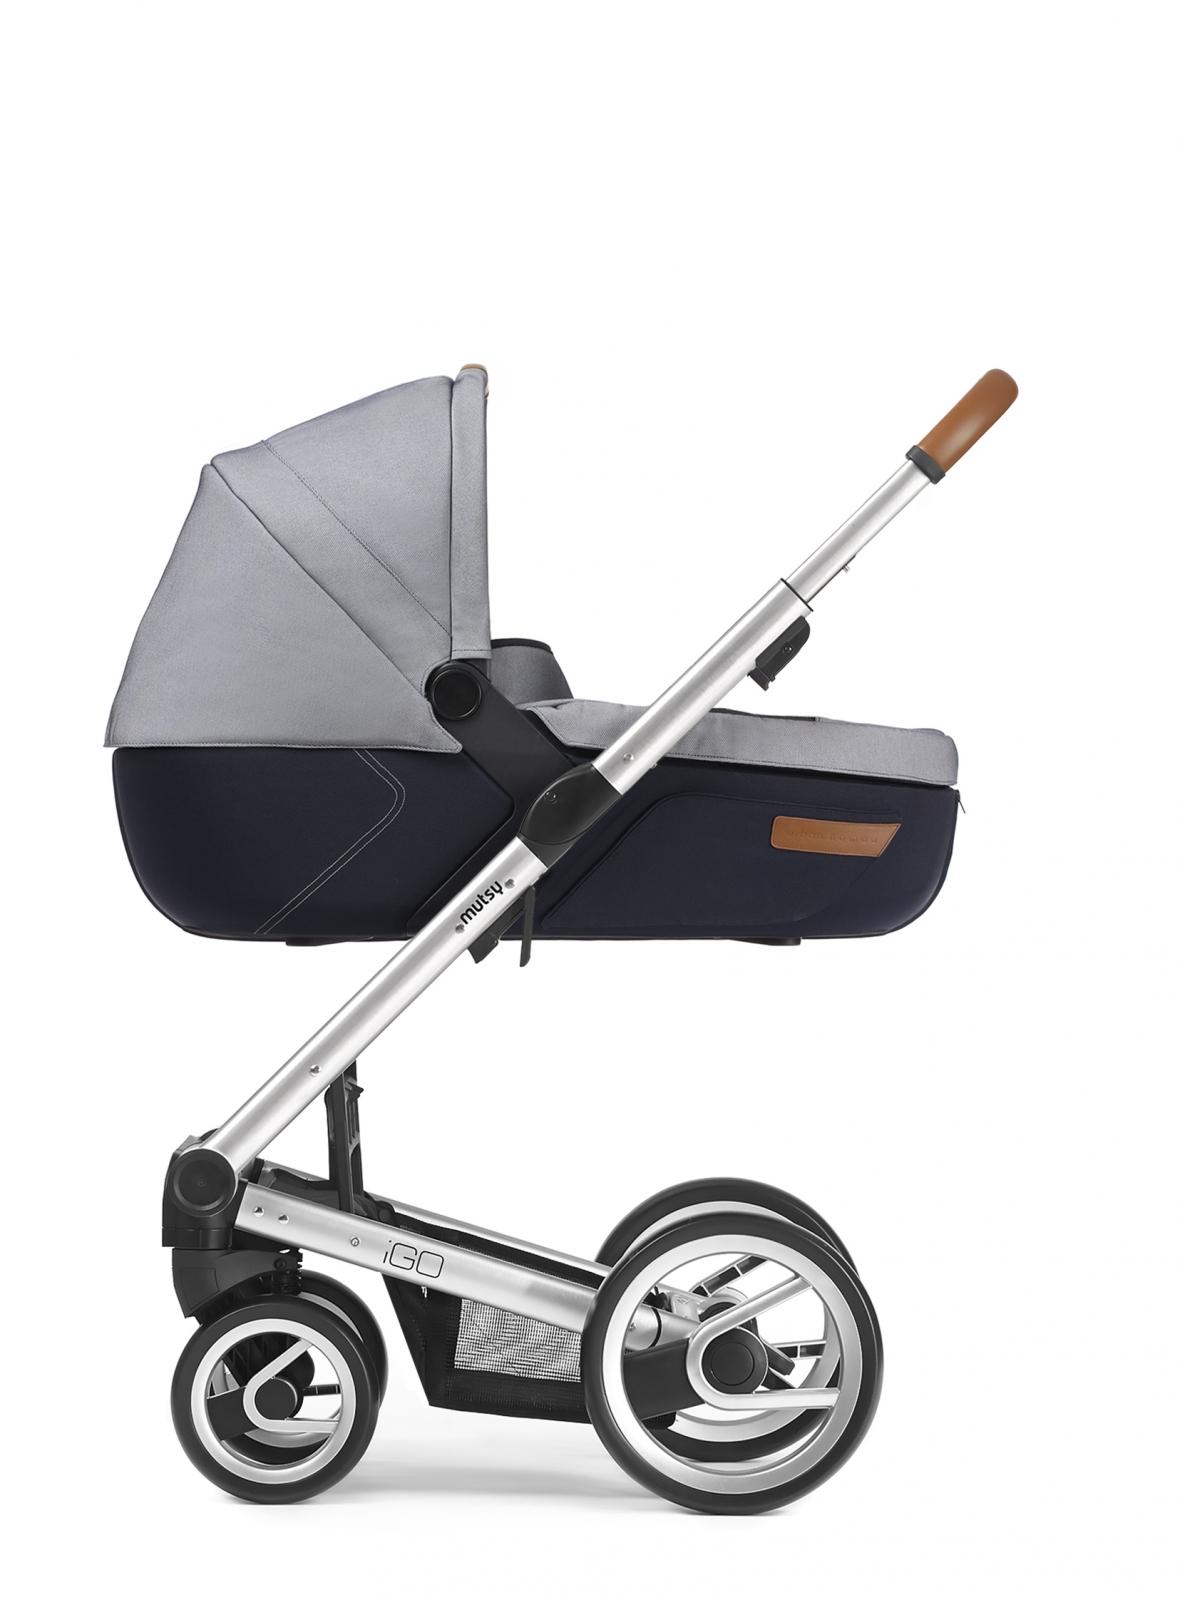 Mutsy Igo Urban Nomad - Standard Chassis